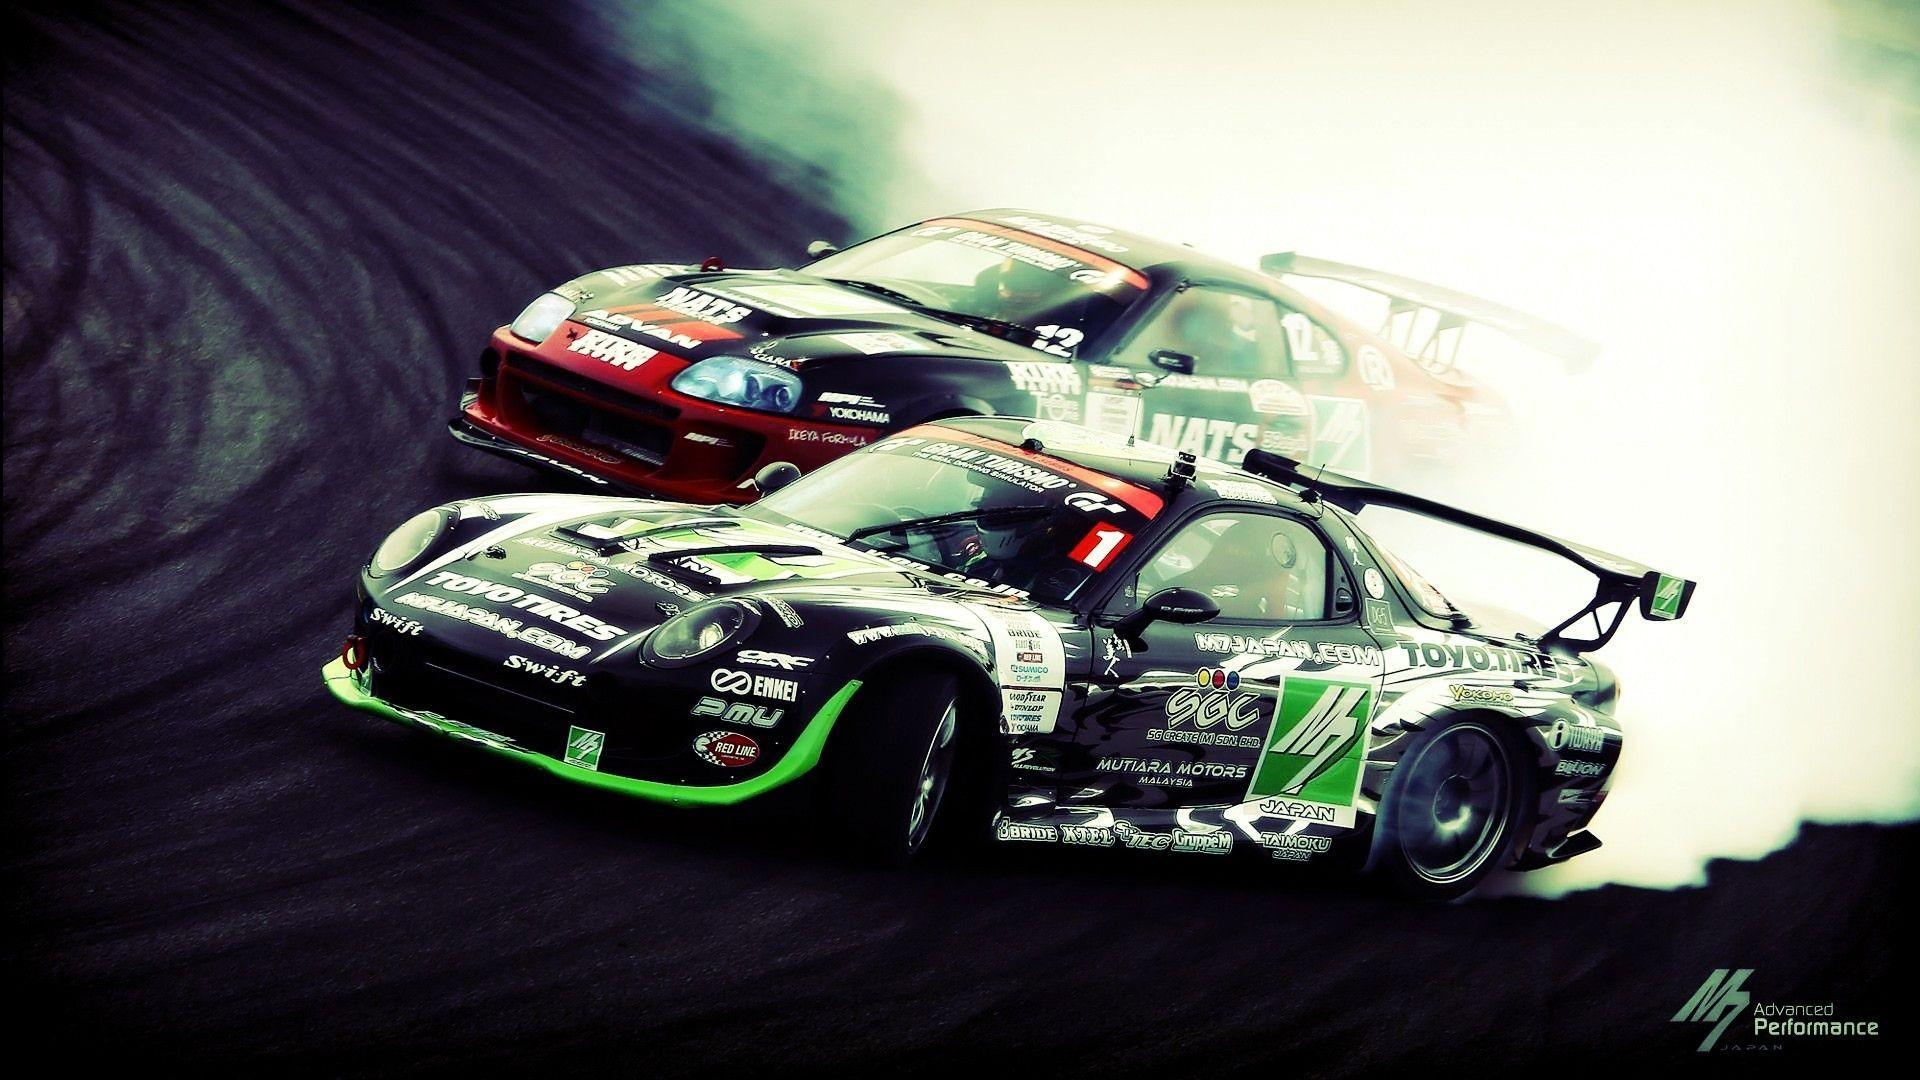 Mazda Race Car Wallpaper Drift Cars Wallpaper 71 Images